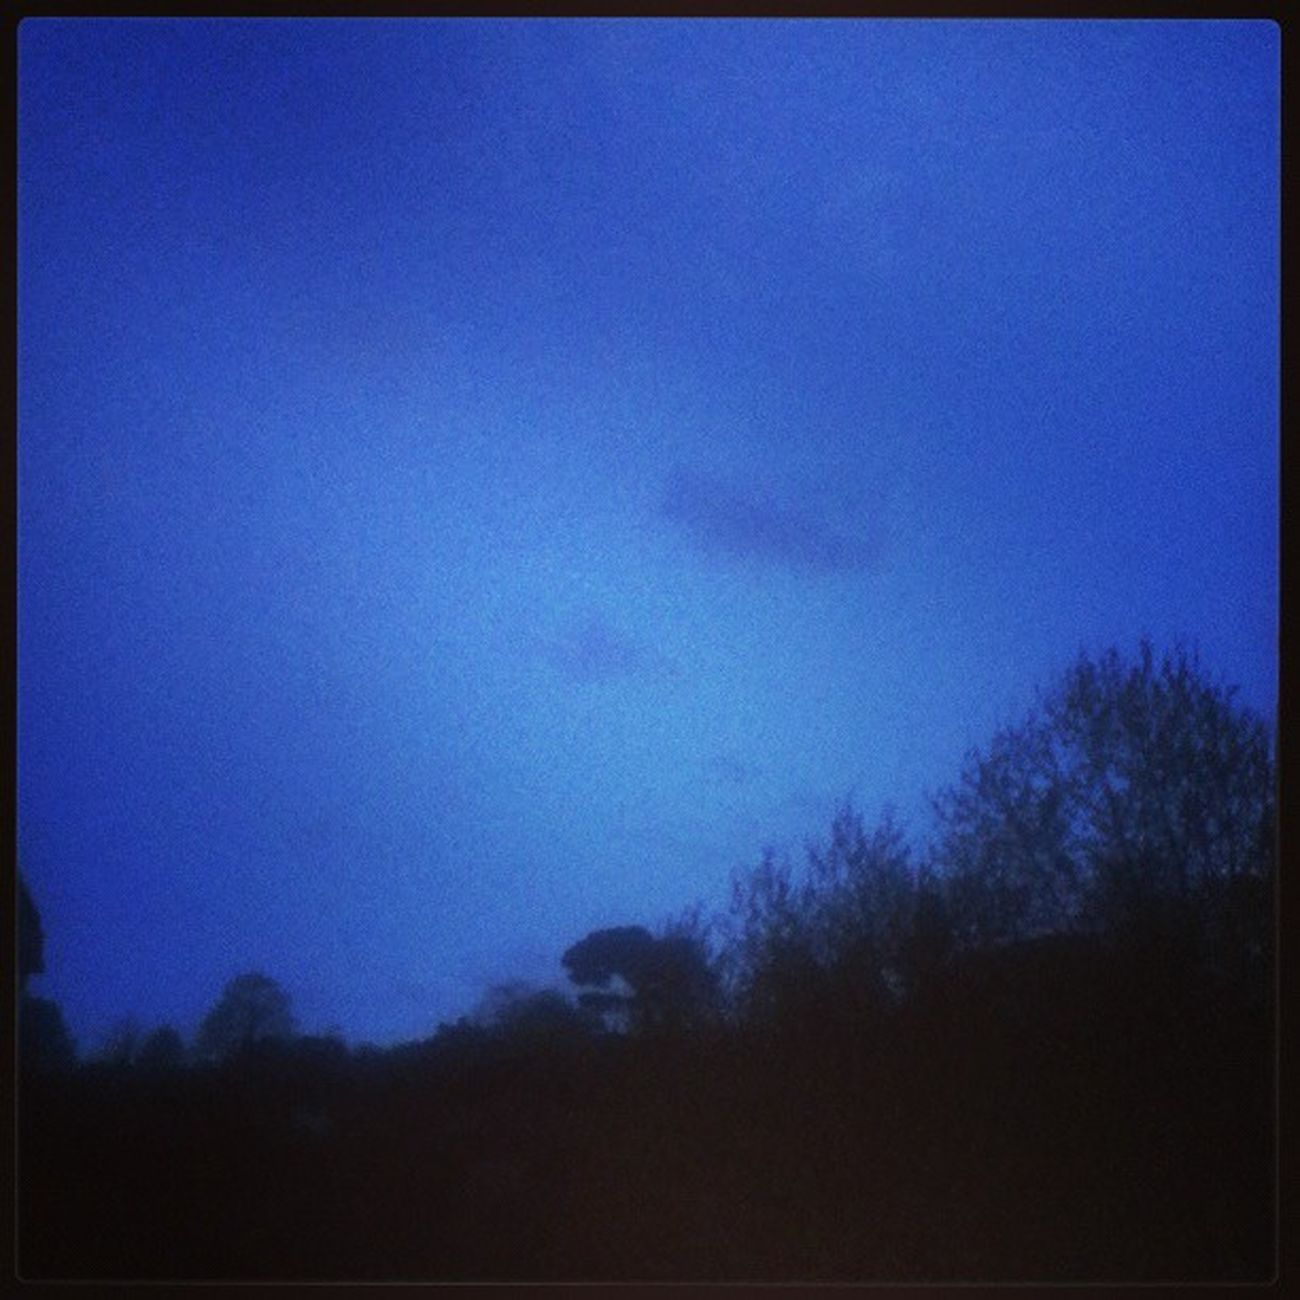 Bir bahar aksami gokyuzu ve dinazor agacim;) Istanbul Instaturk Sky Instamood Ig Igersturkiye Igmasters Ig_captures Instagramers Instahappy Instagramhub Night